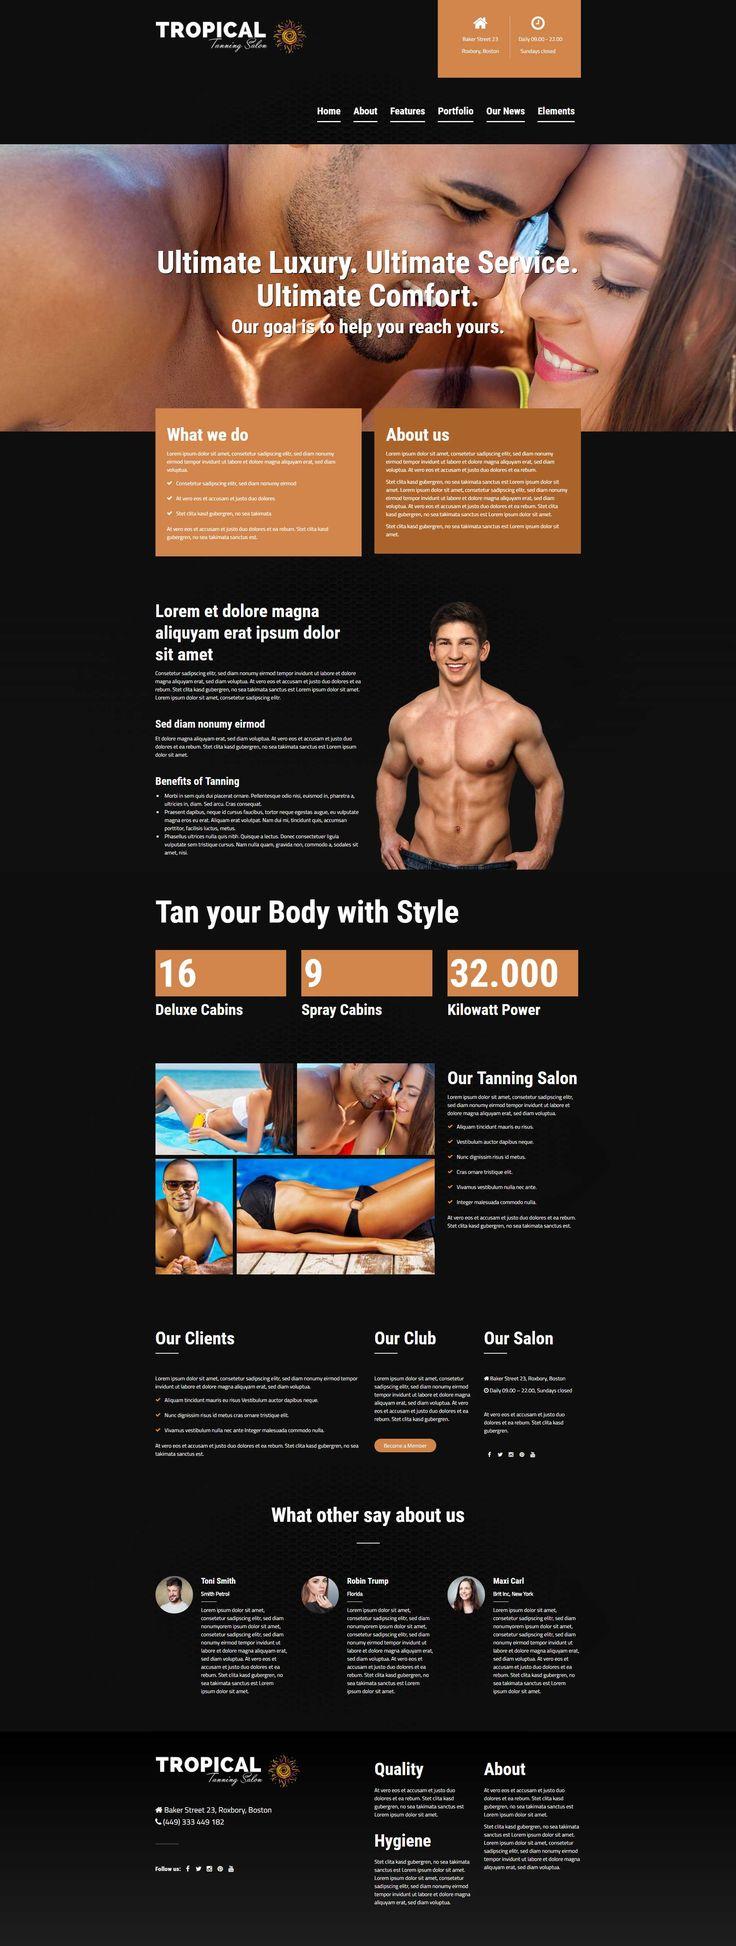 Tropical - a dark designed tanning salon WordPress Theme